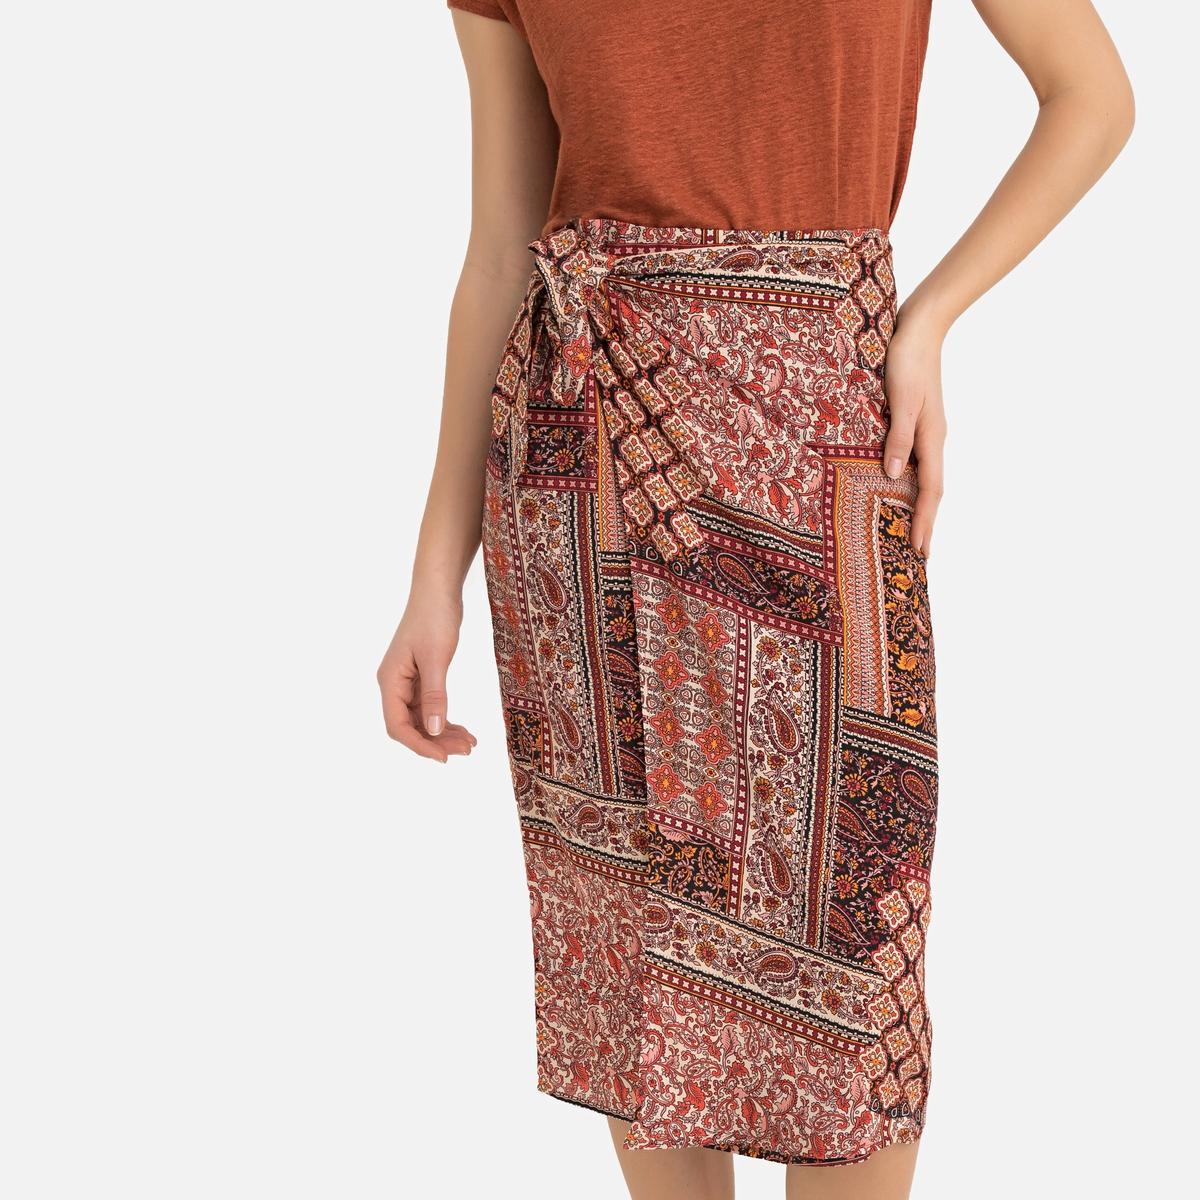 Falda recta semilarga, estampado estilo fular